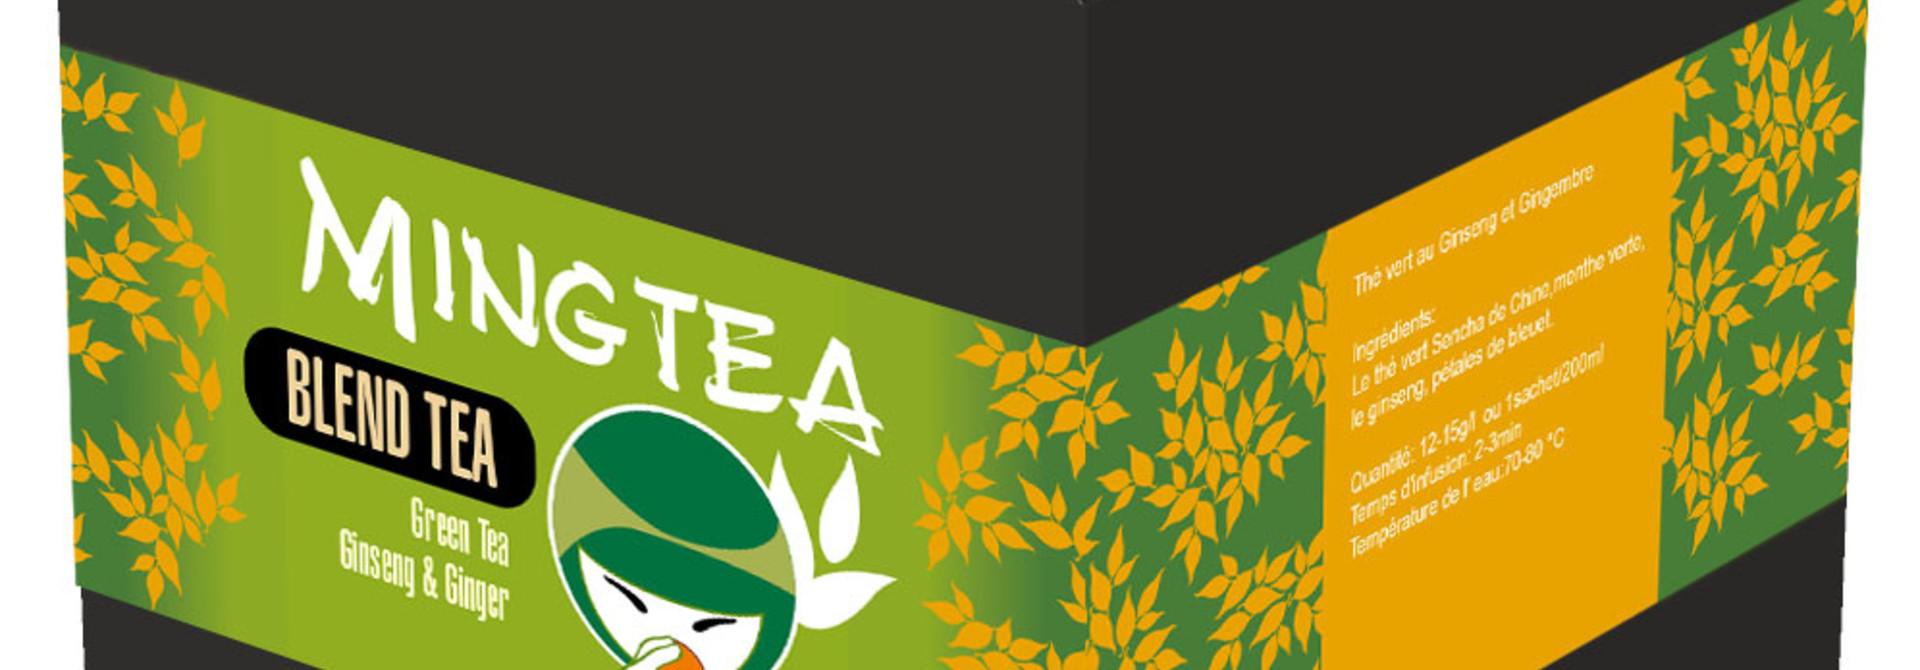 Grüner Tee Ginseng & Ginger - 20 Pyramiden beutel